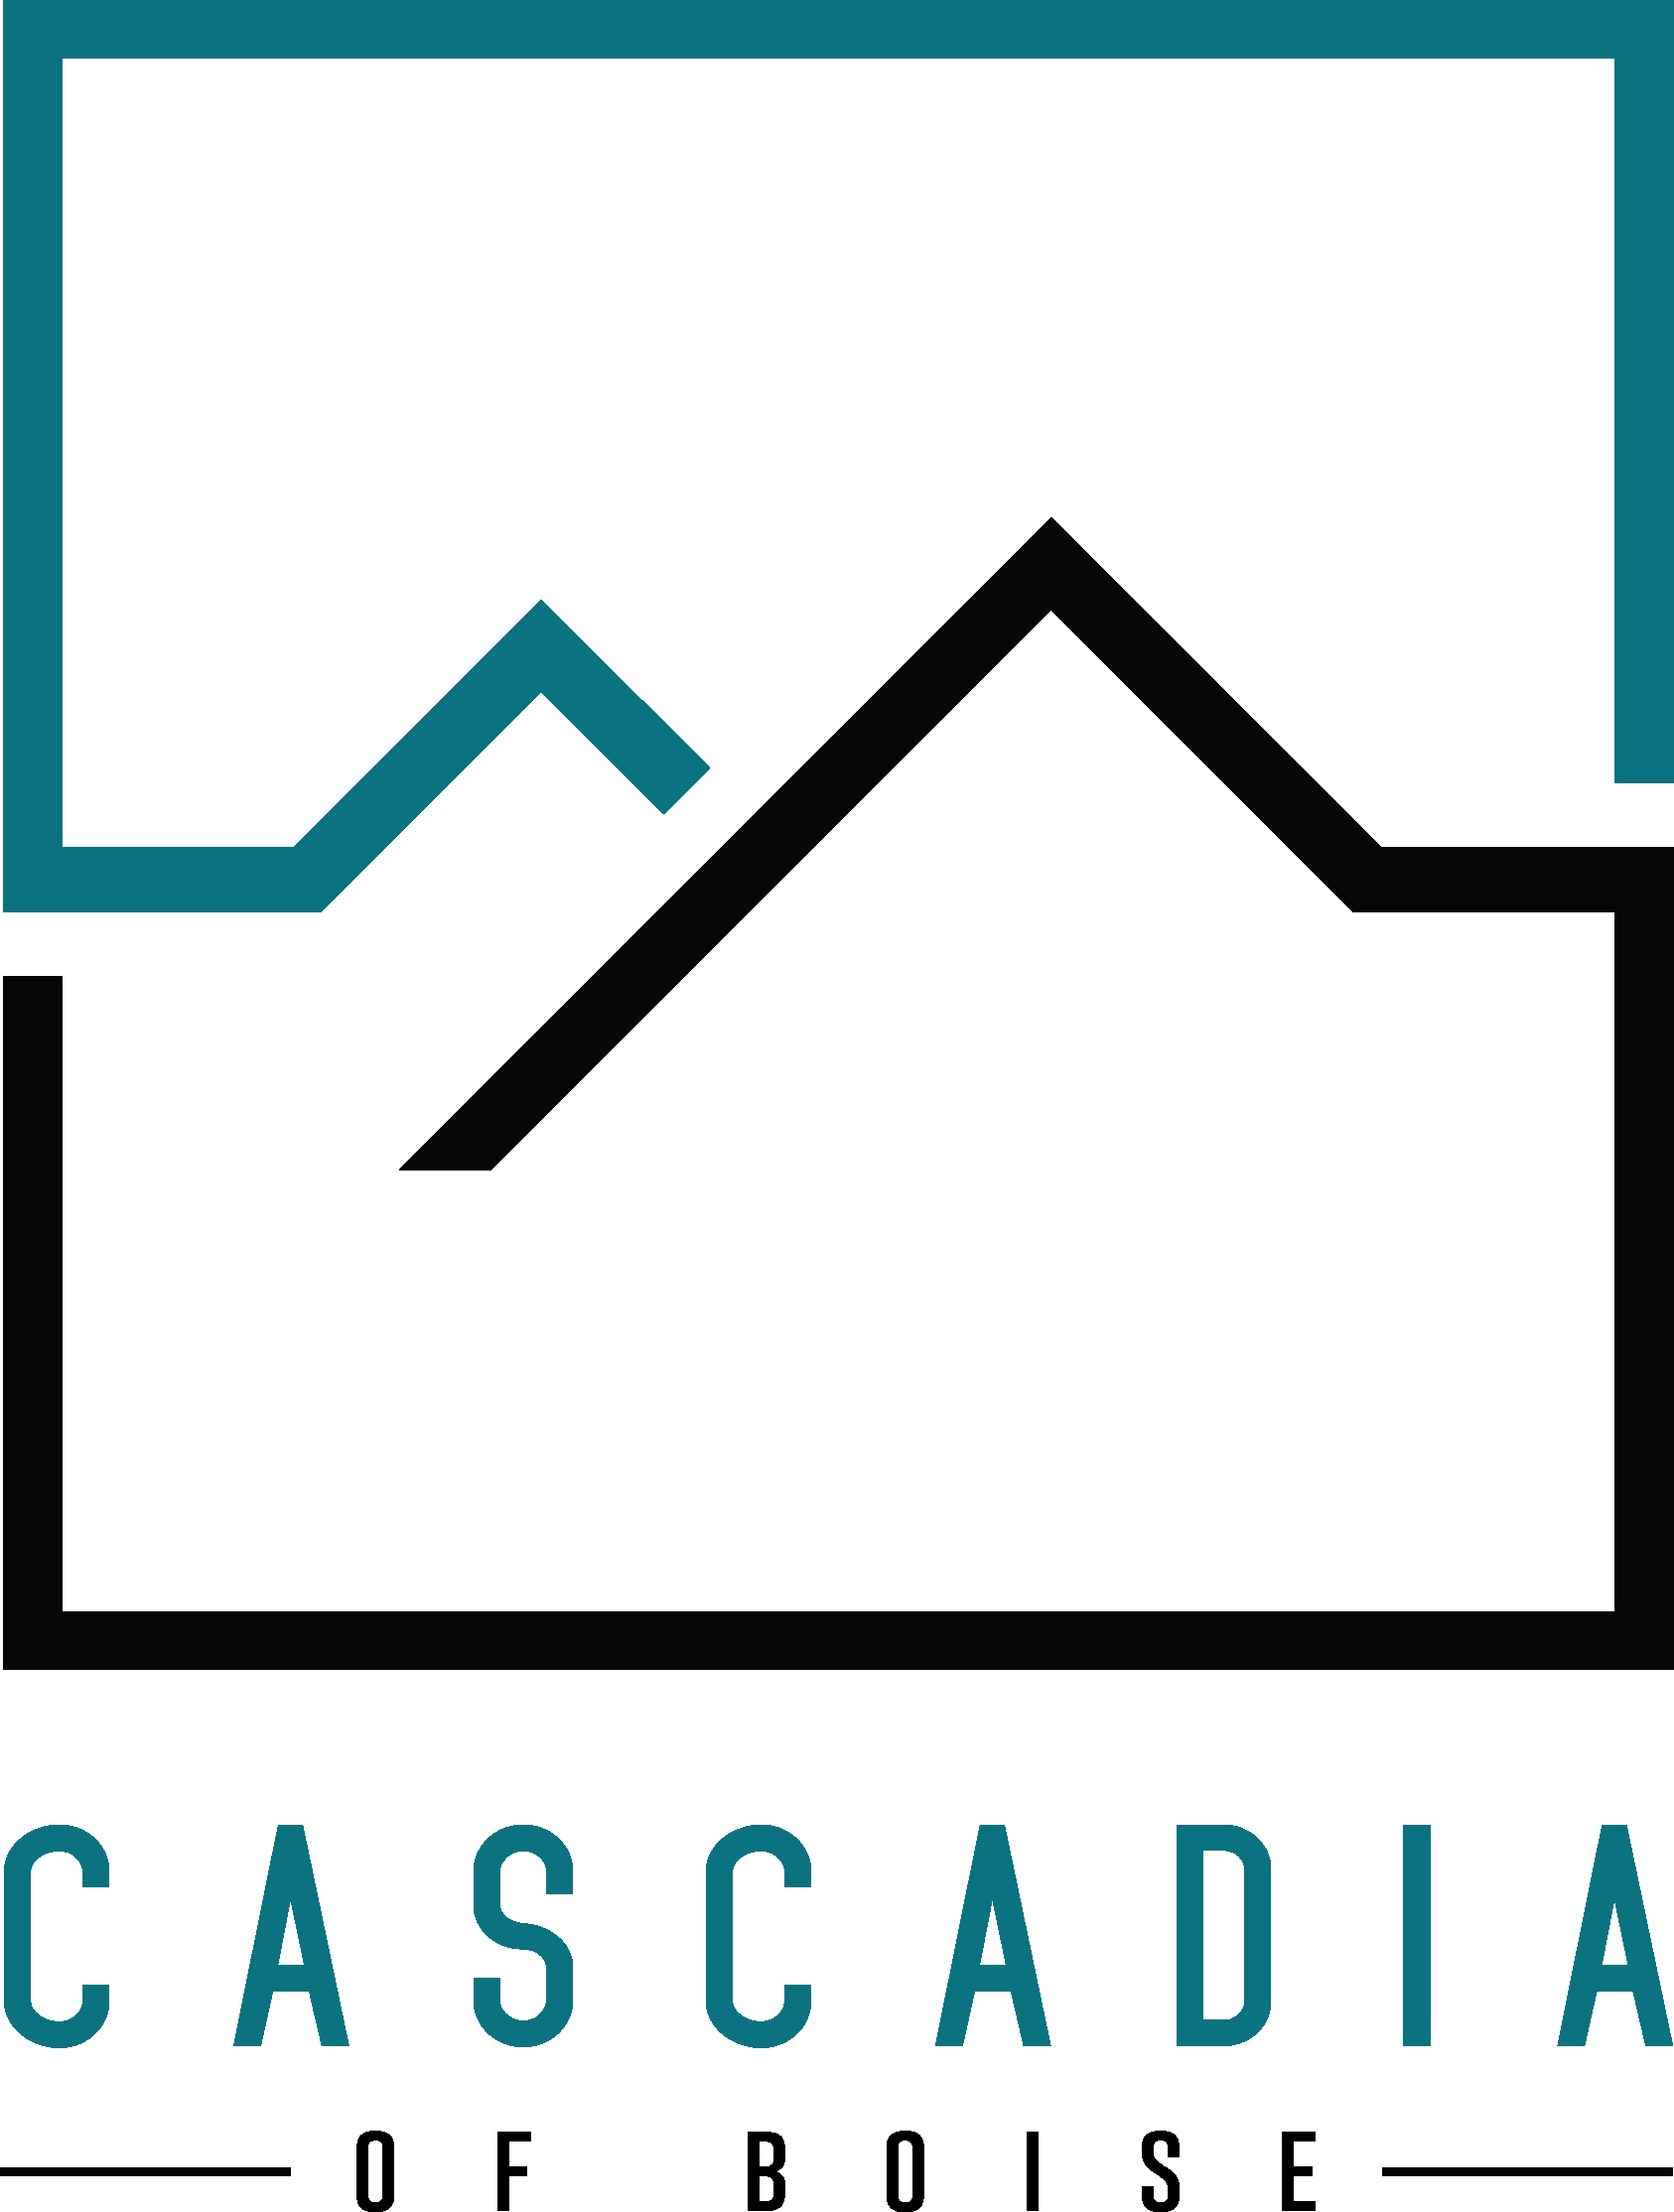 Cascadia of Boise